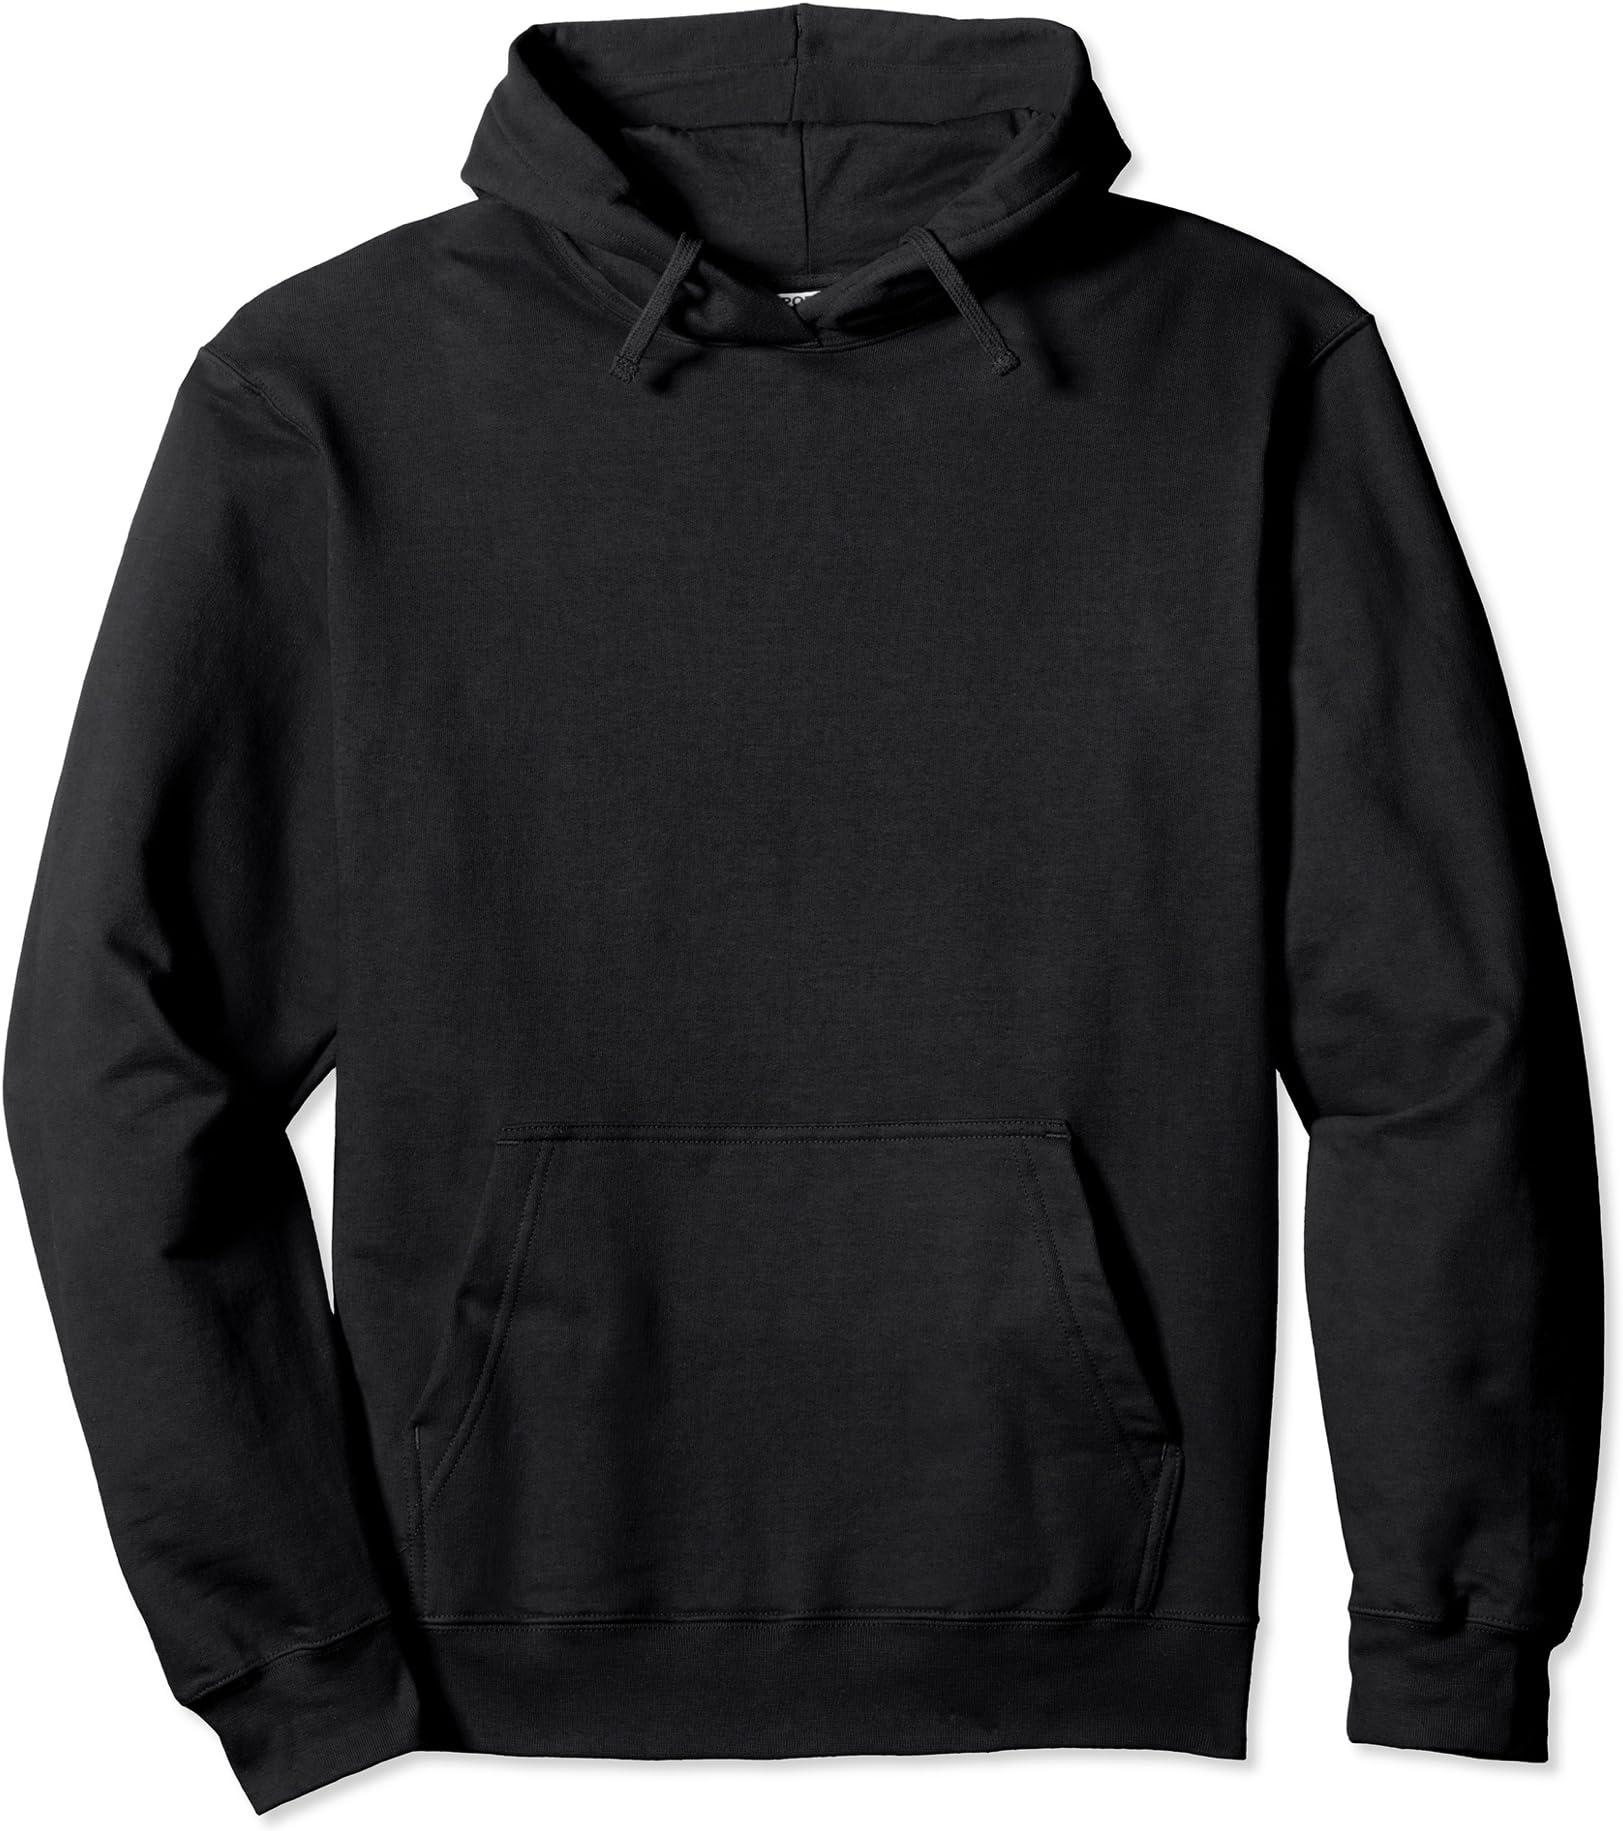 Grandchildren are The Best prizes Family Matching Zip Hooded Sweatshirt